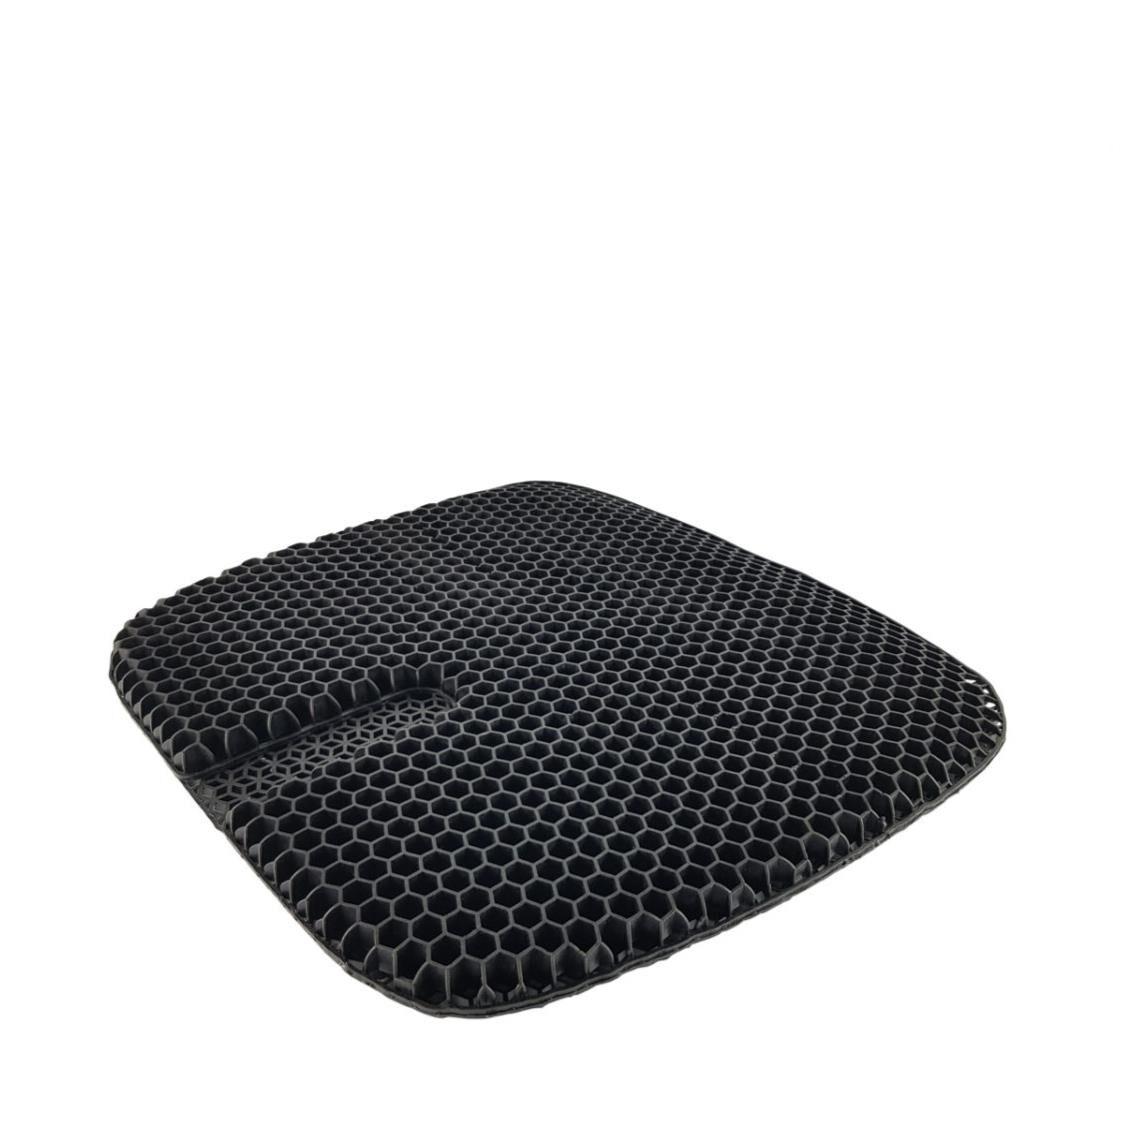 True Relief Honeycomb Cooling TPE Gel Seat Cushion Coal Black